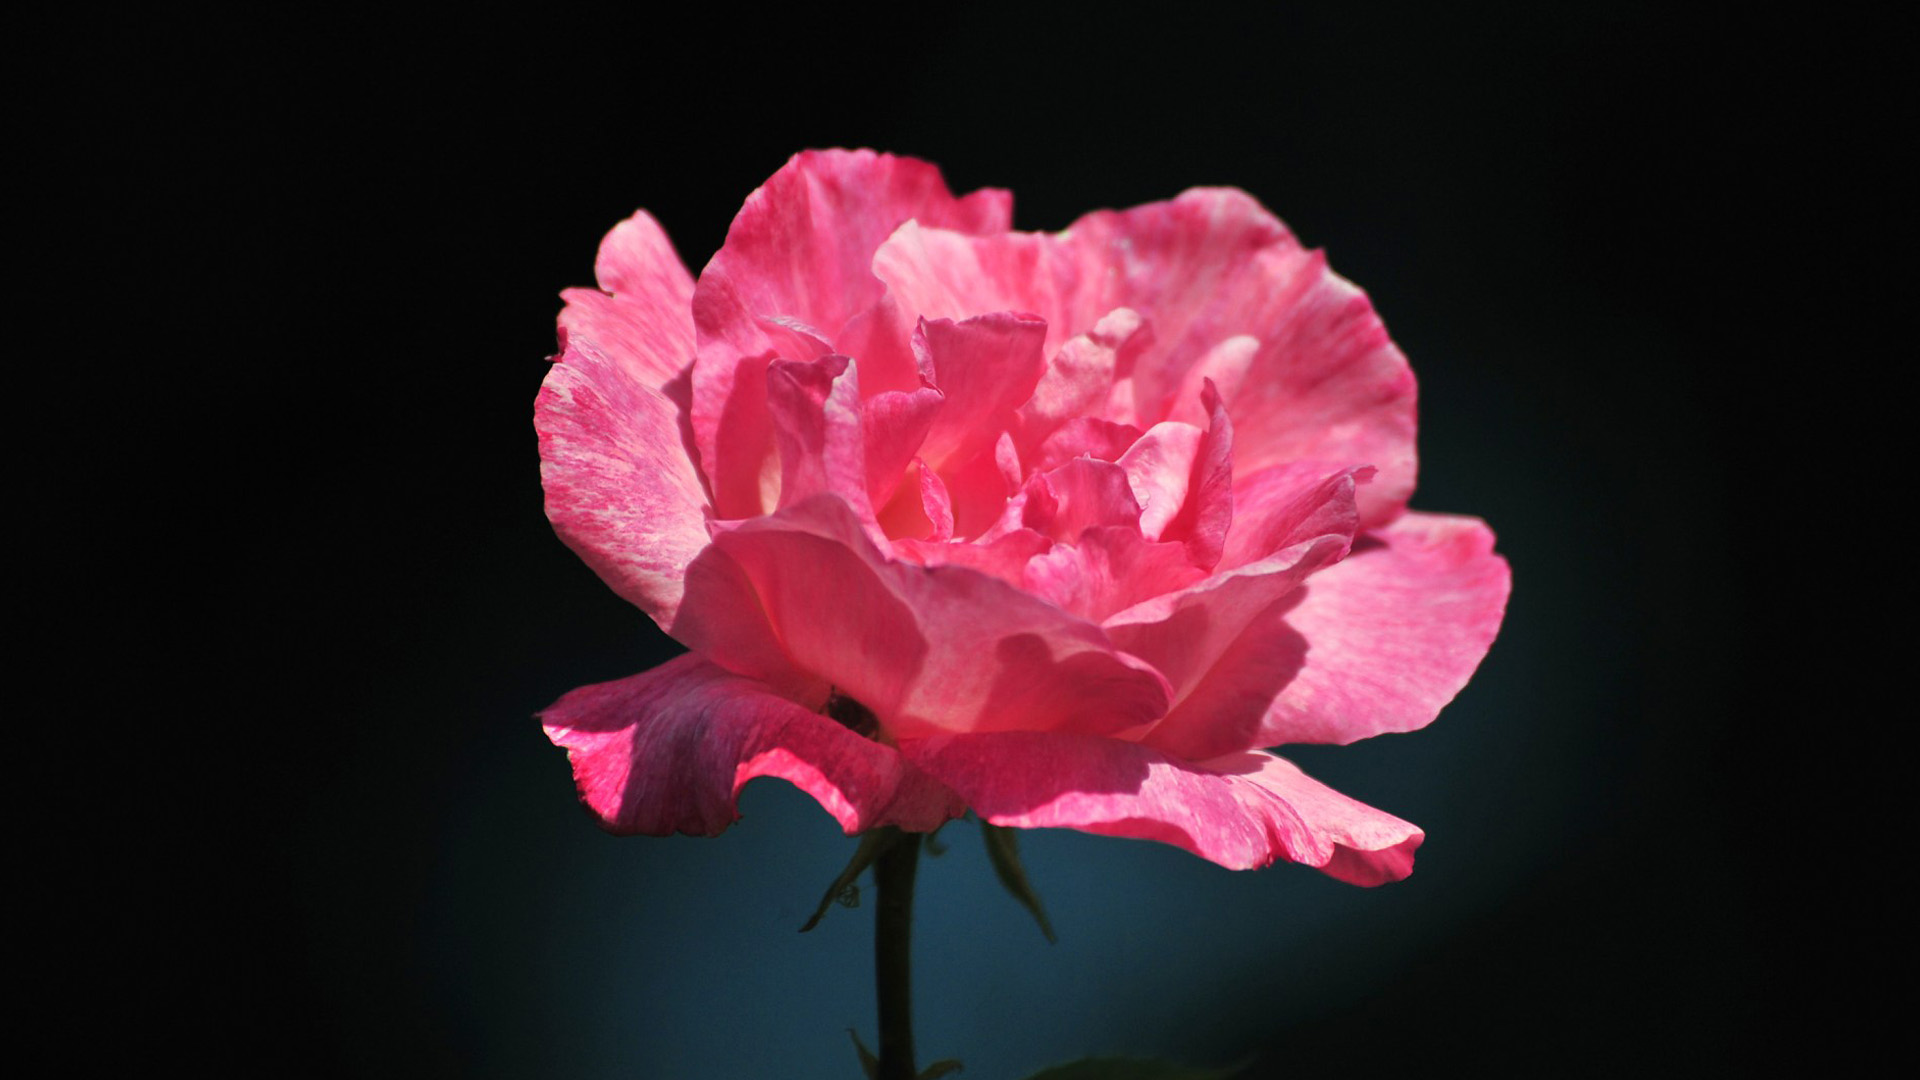 45] Pink and Black Rose Wallpaper on WallpaperSafari 1920x1080